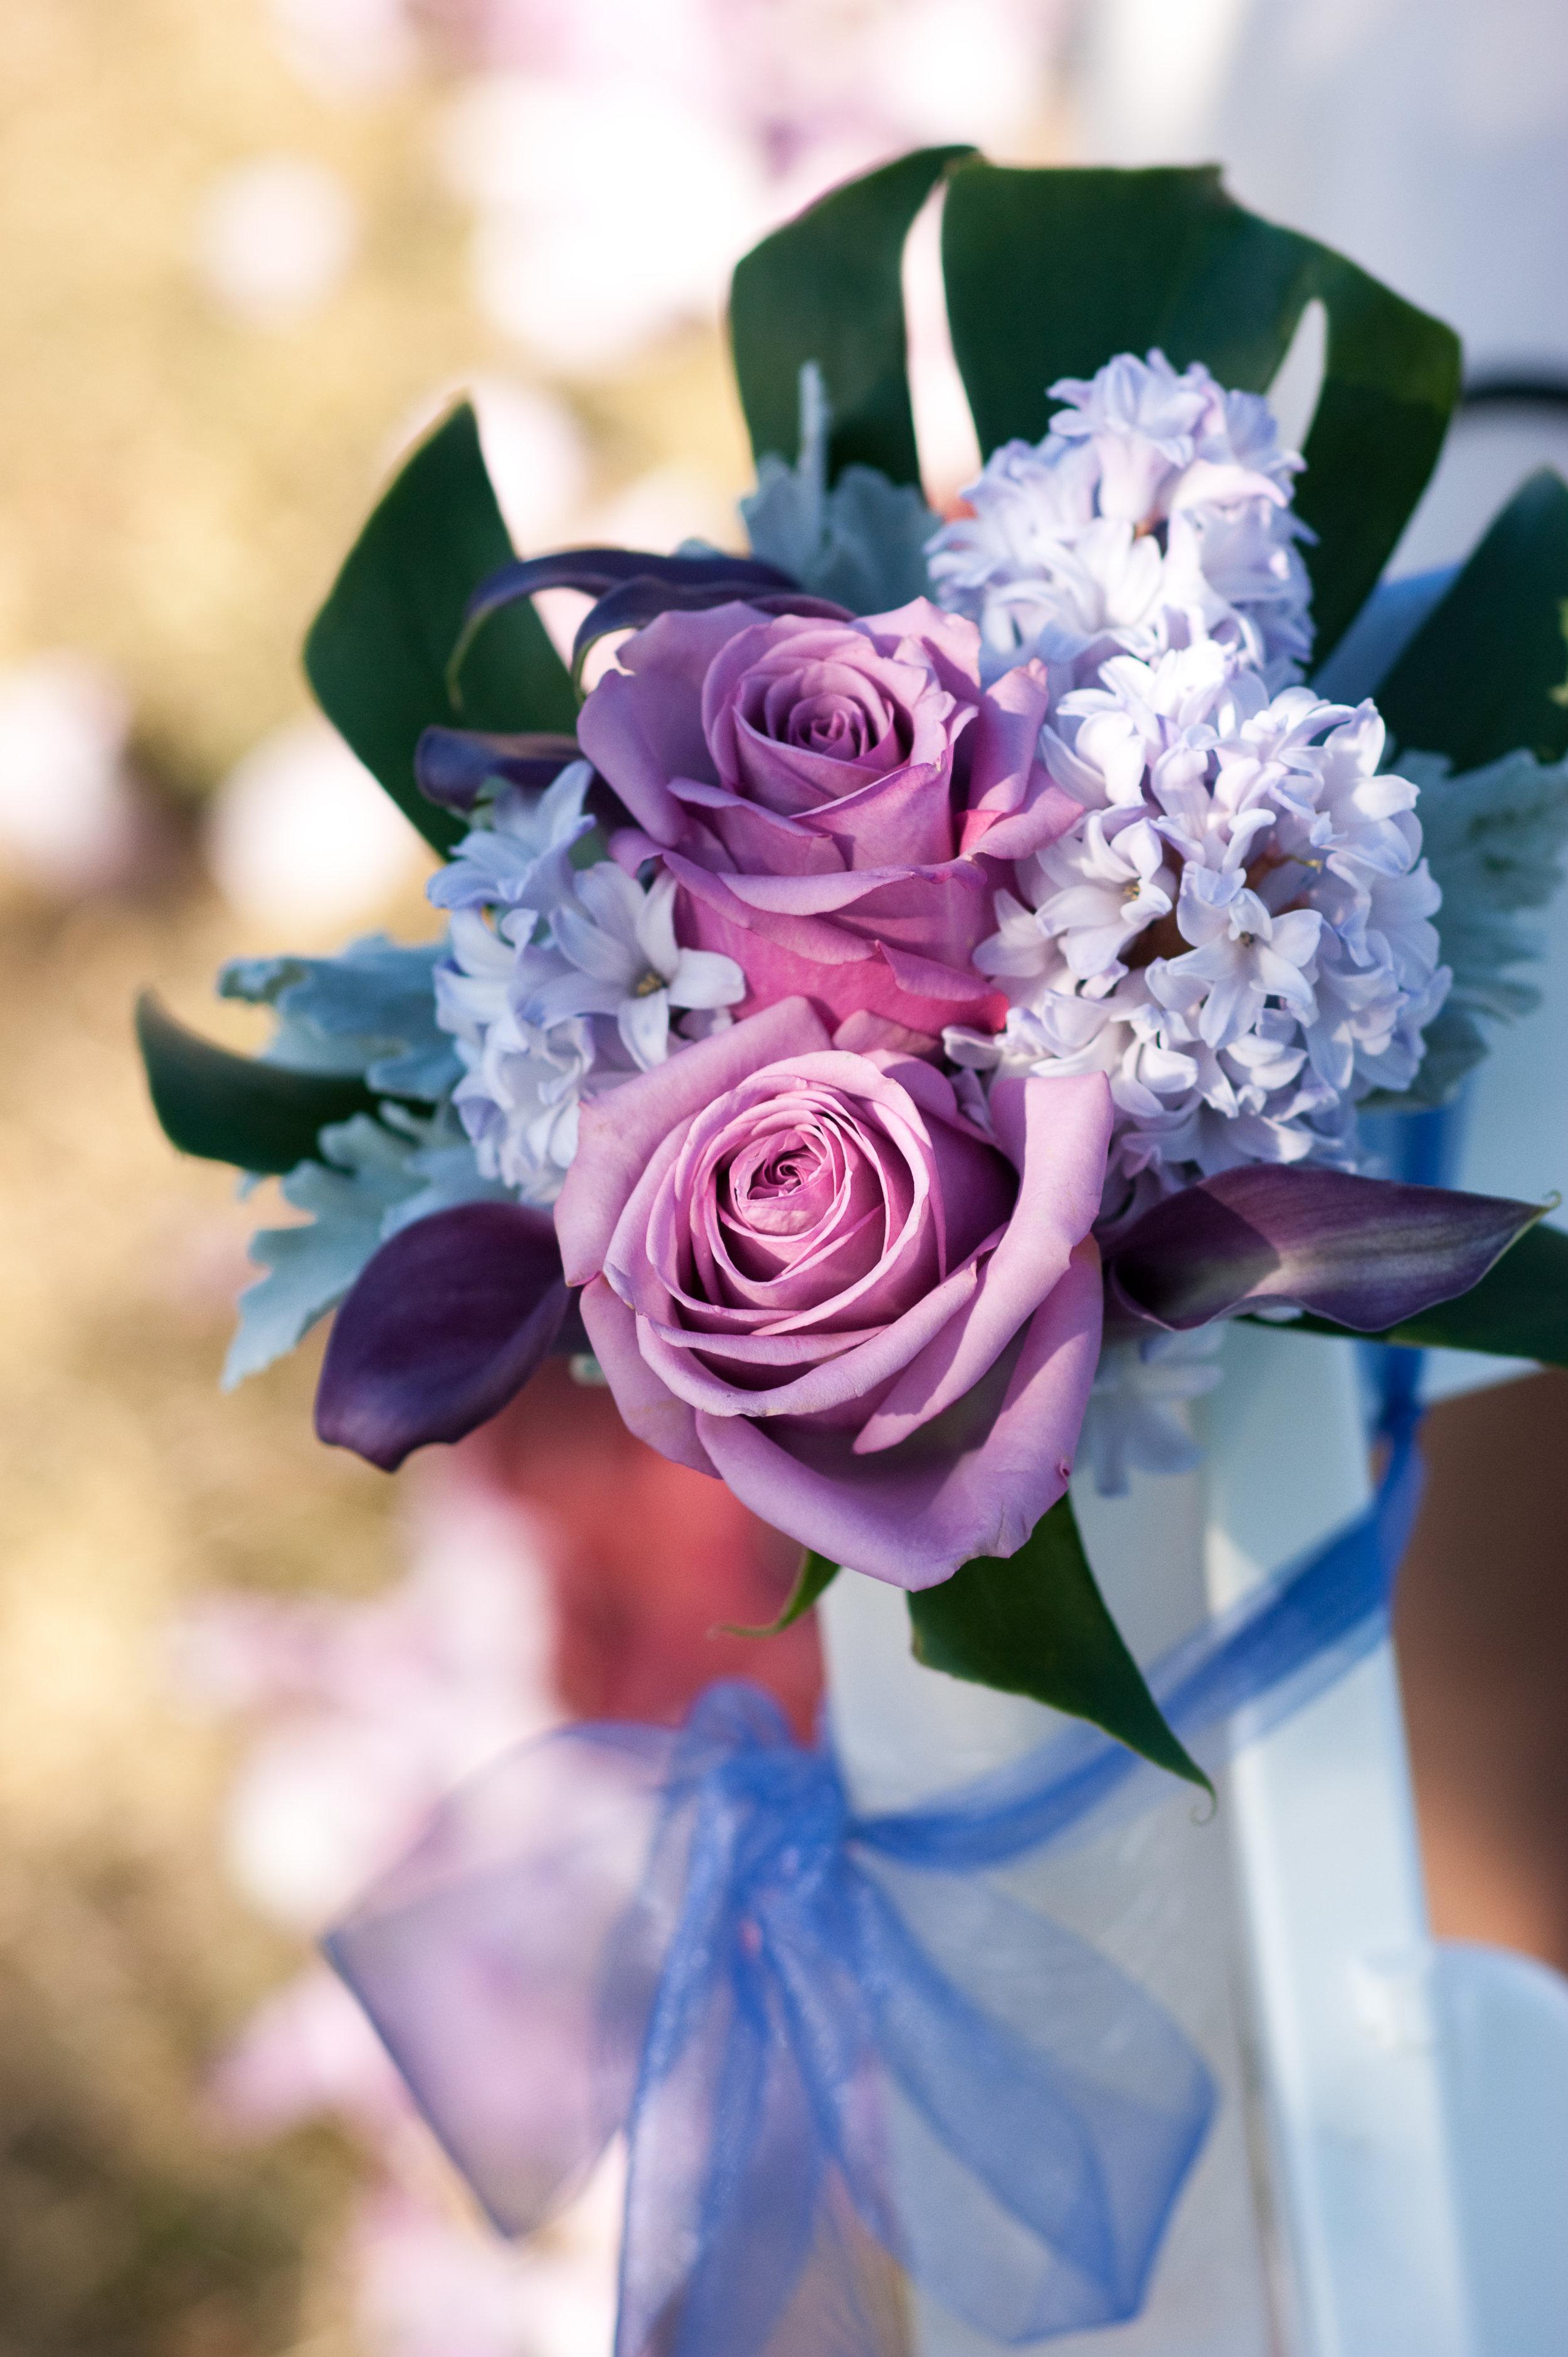 Photo by Sea Studio, Flowers by Bella Rugosa